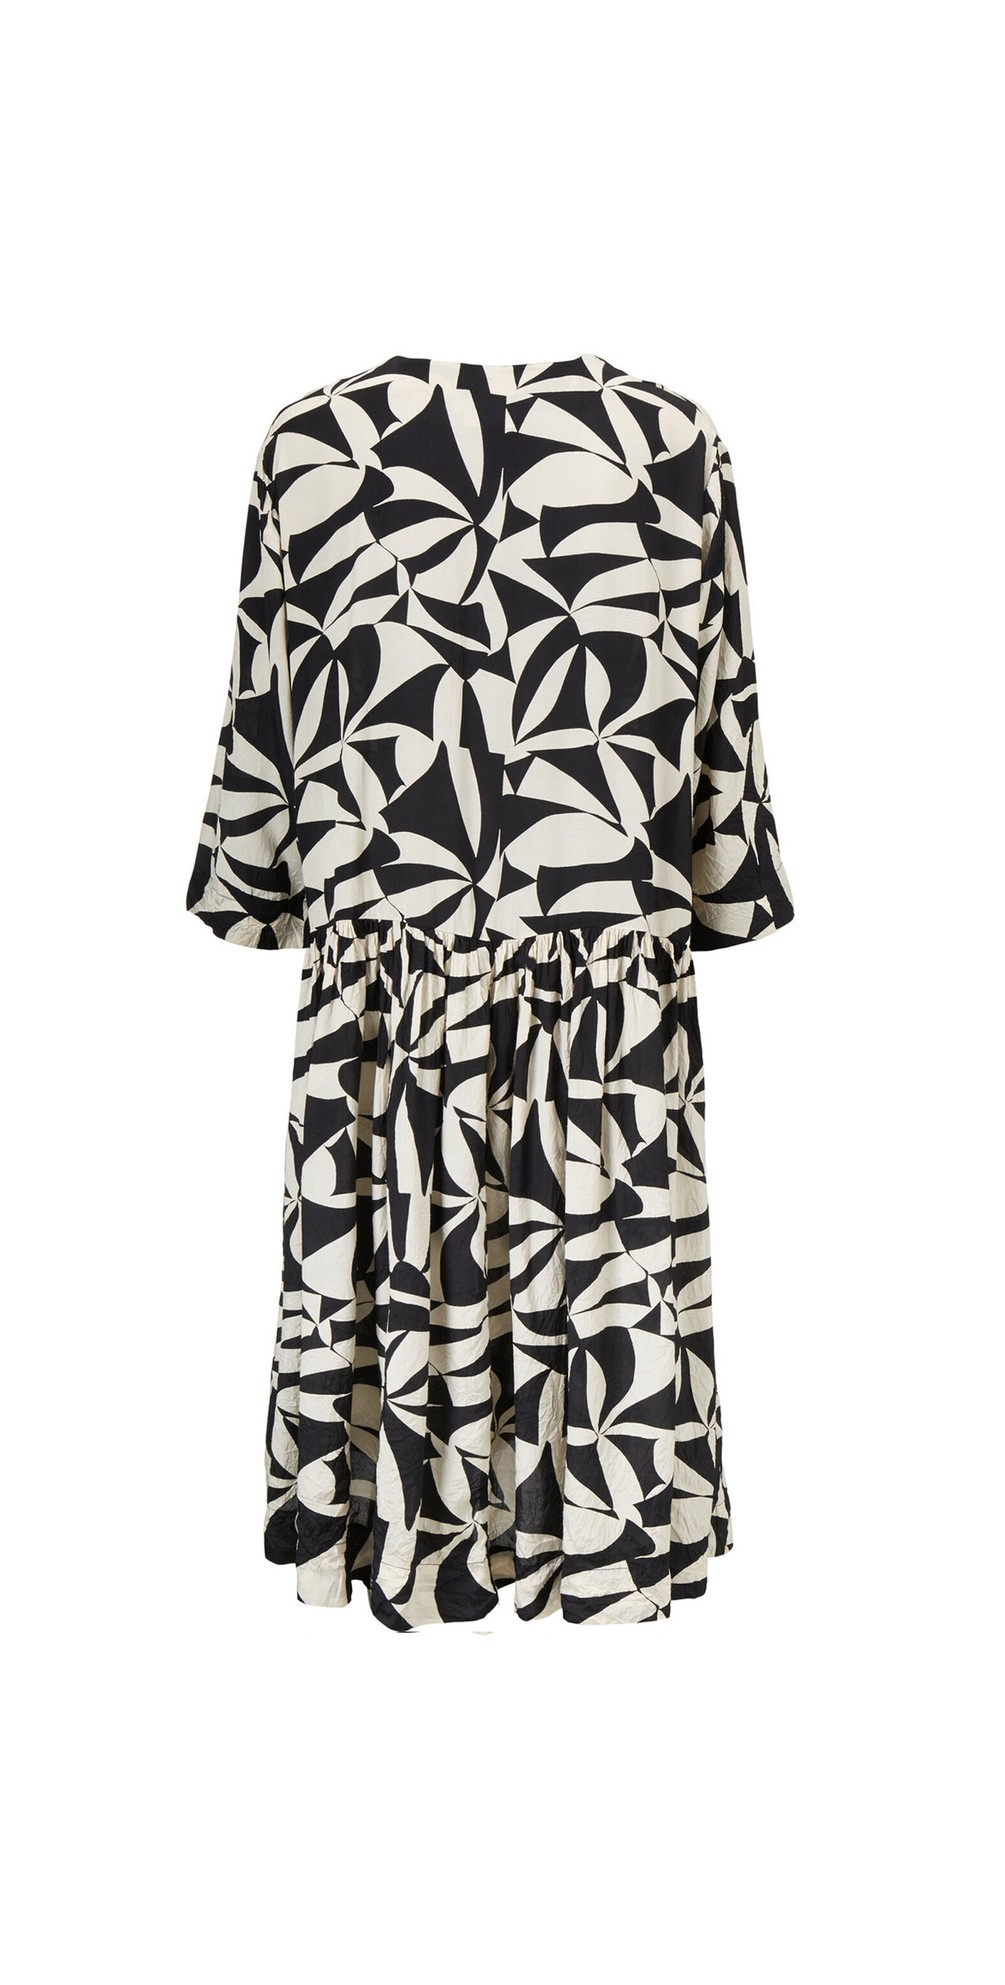 Naya Monochrome Dress main image